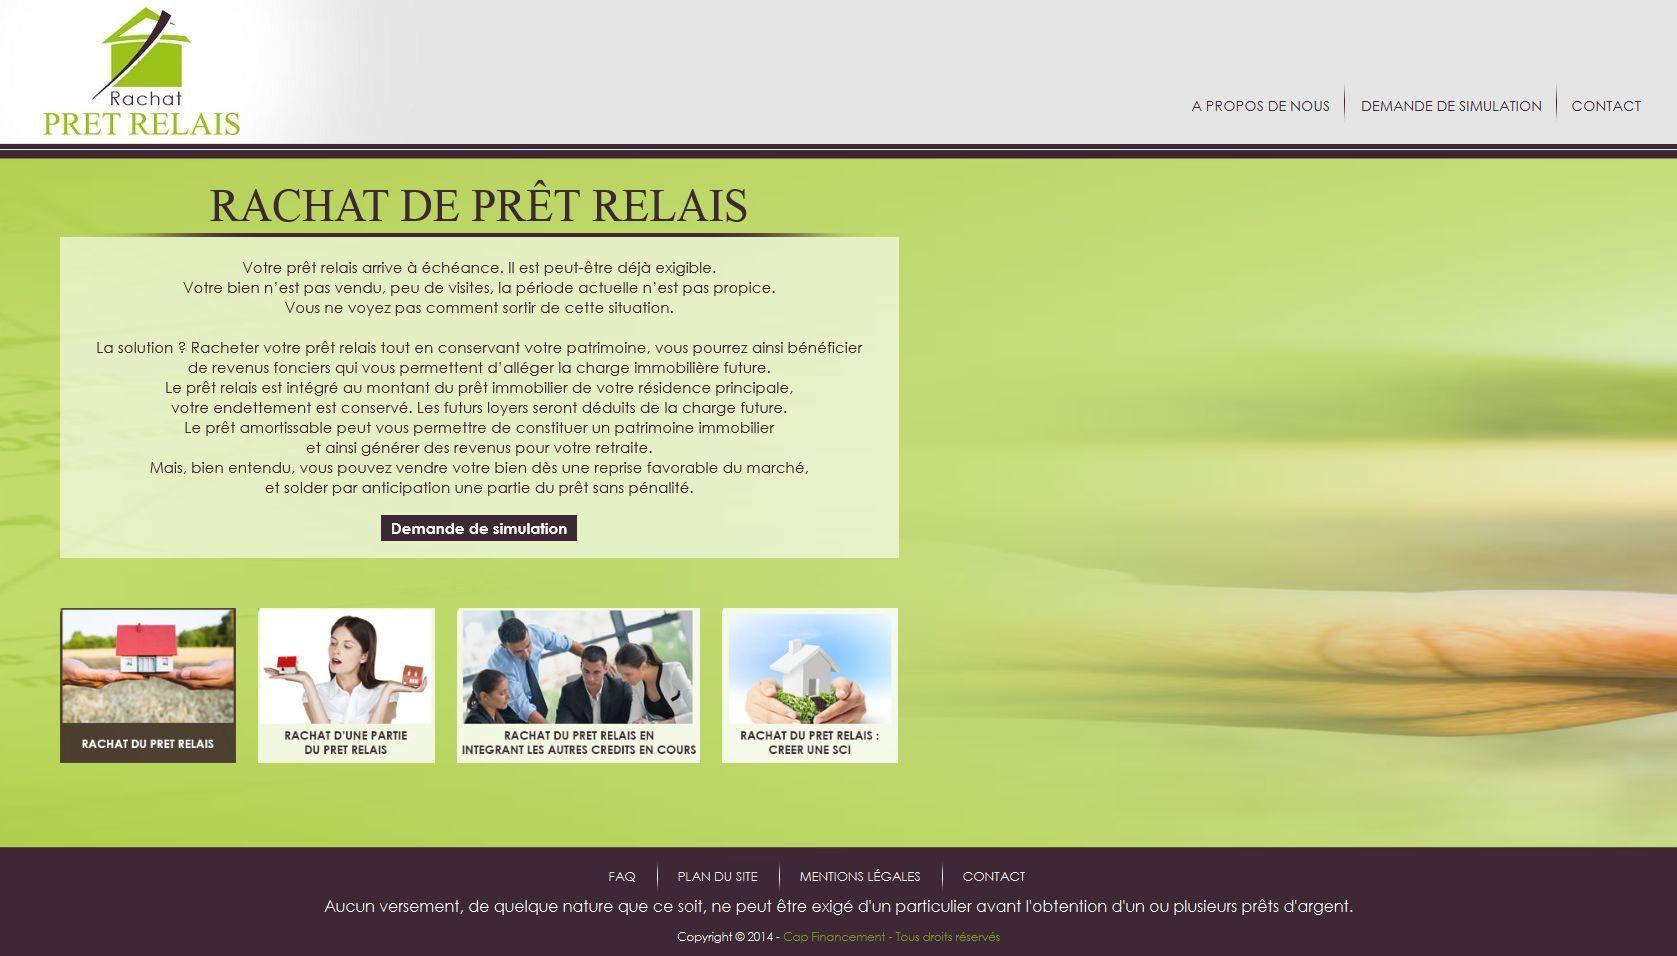 Rachat Prêt Relais